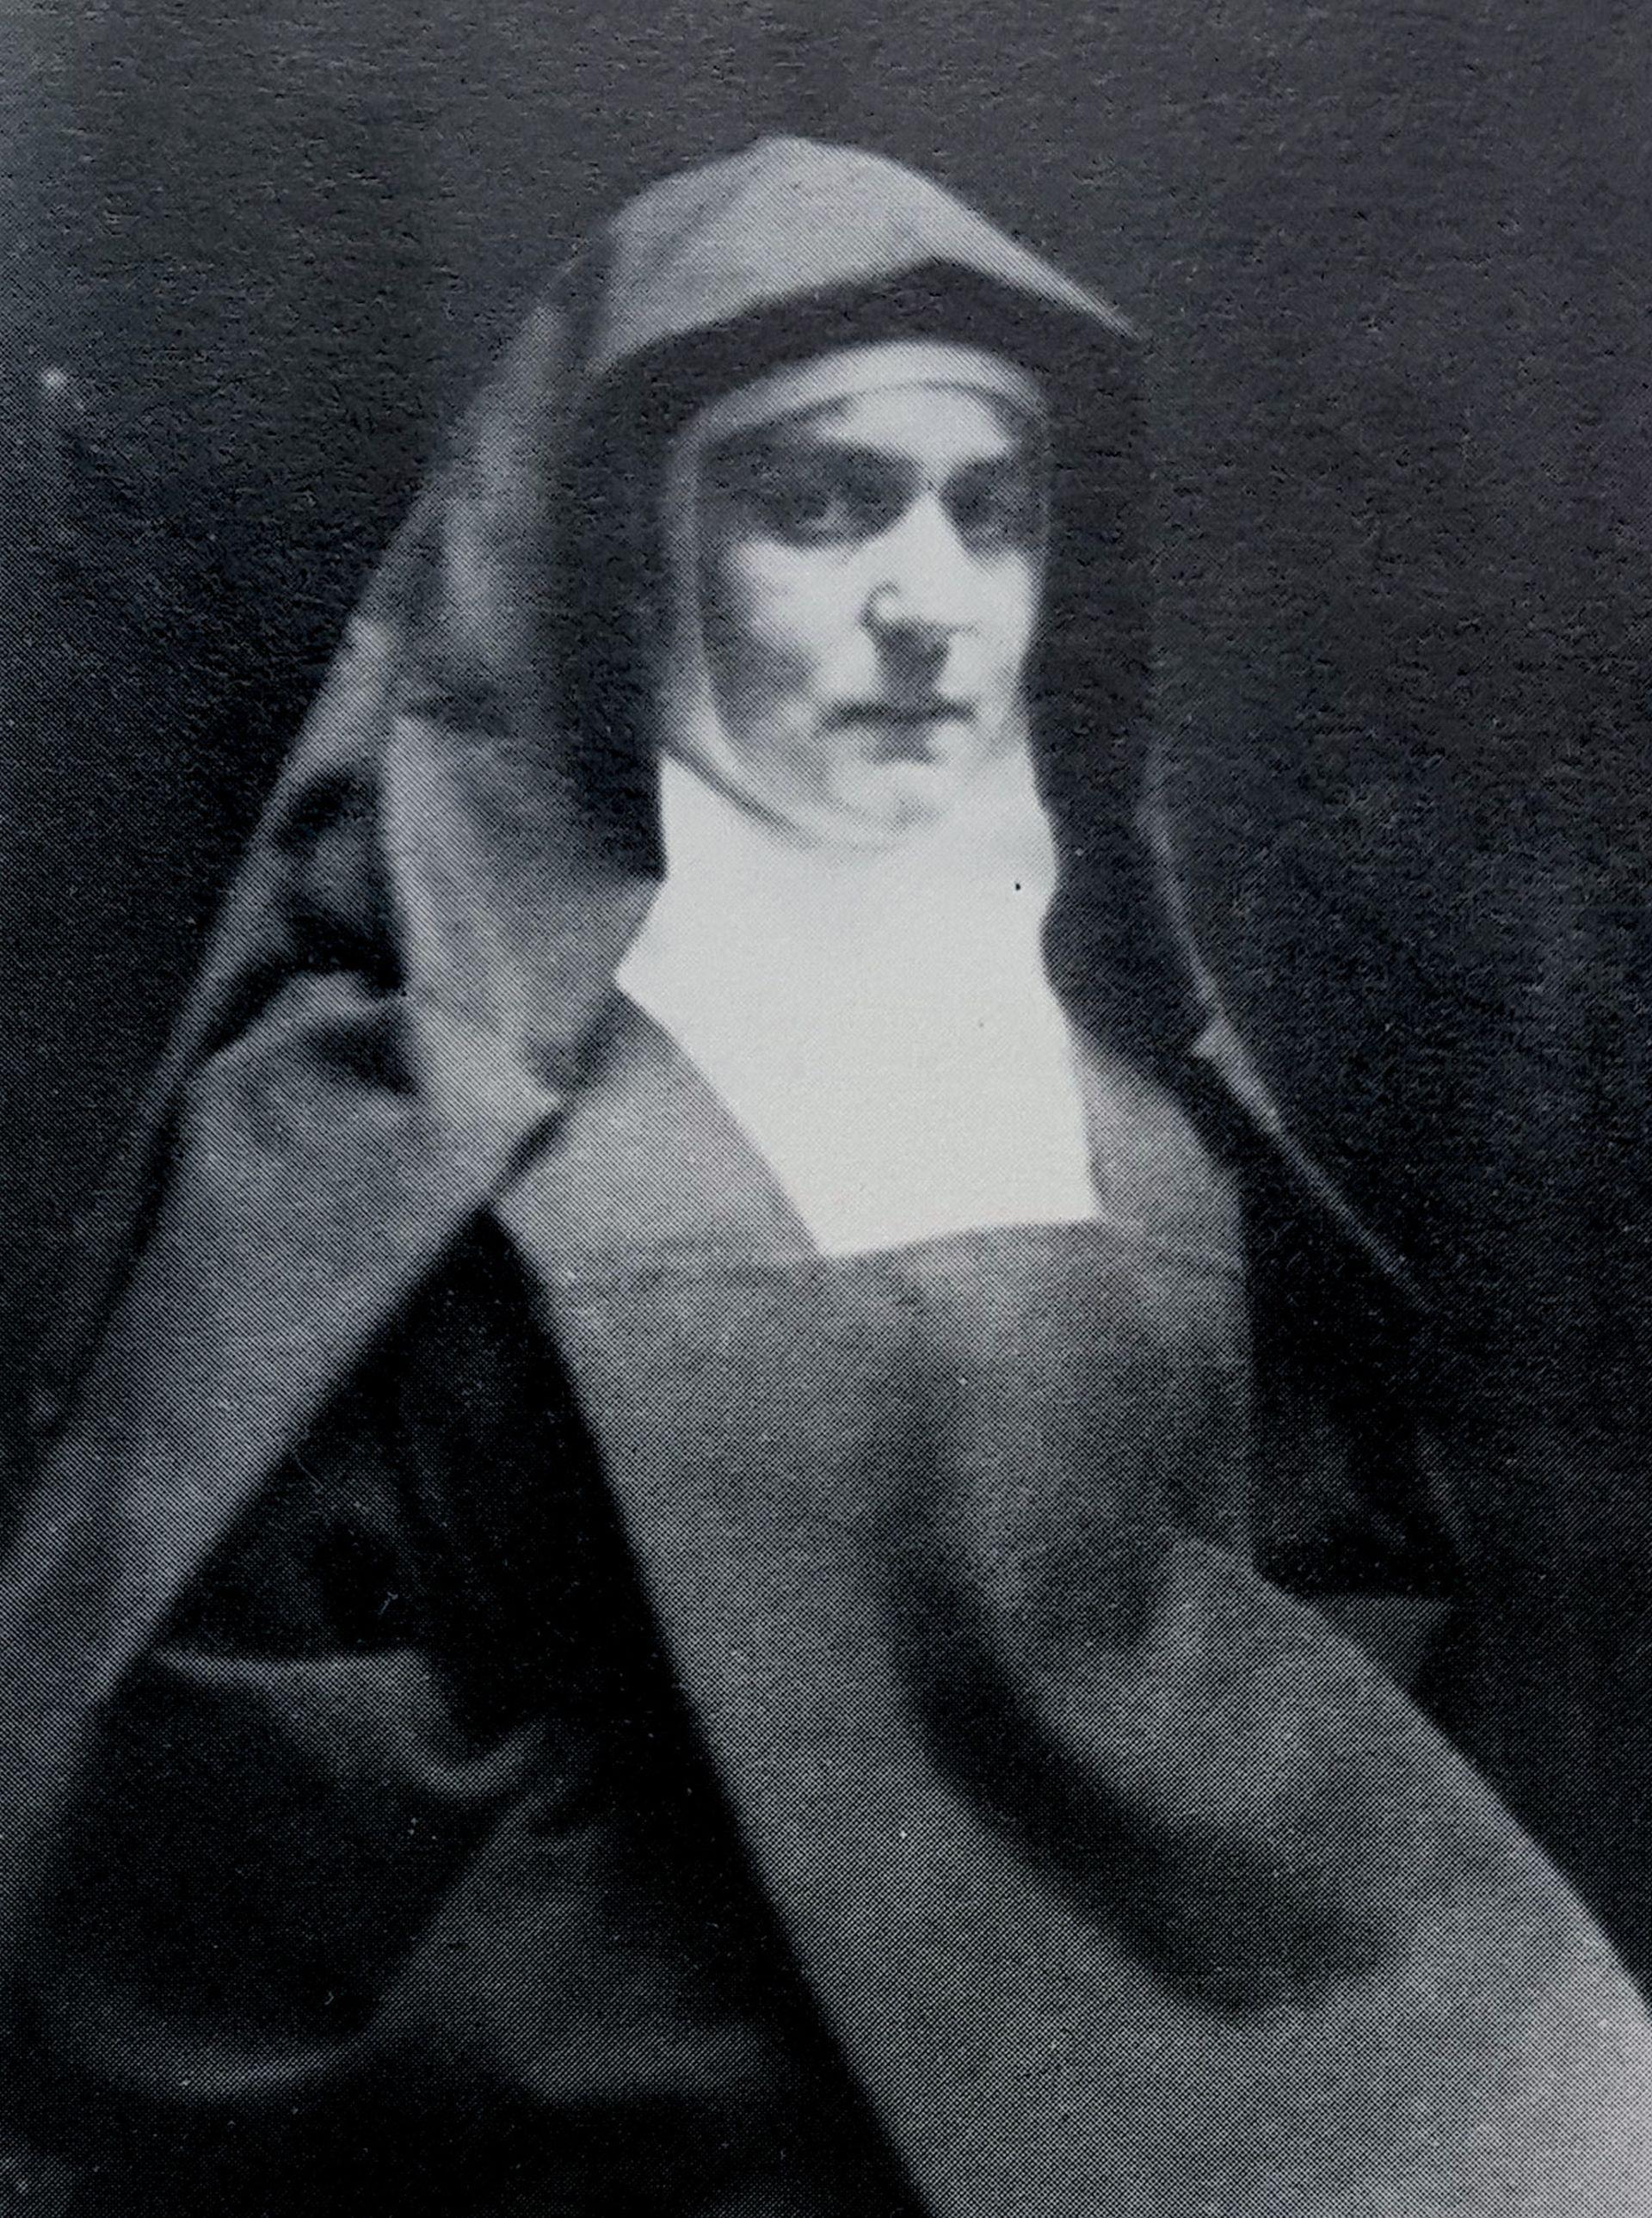 'Moj roman o Edith Stein otkriva pravo lice hrabre svetice'